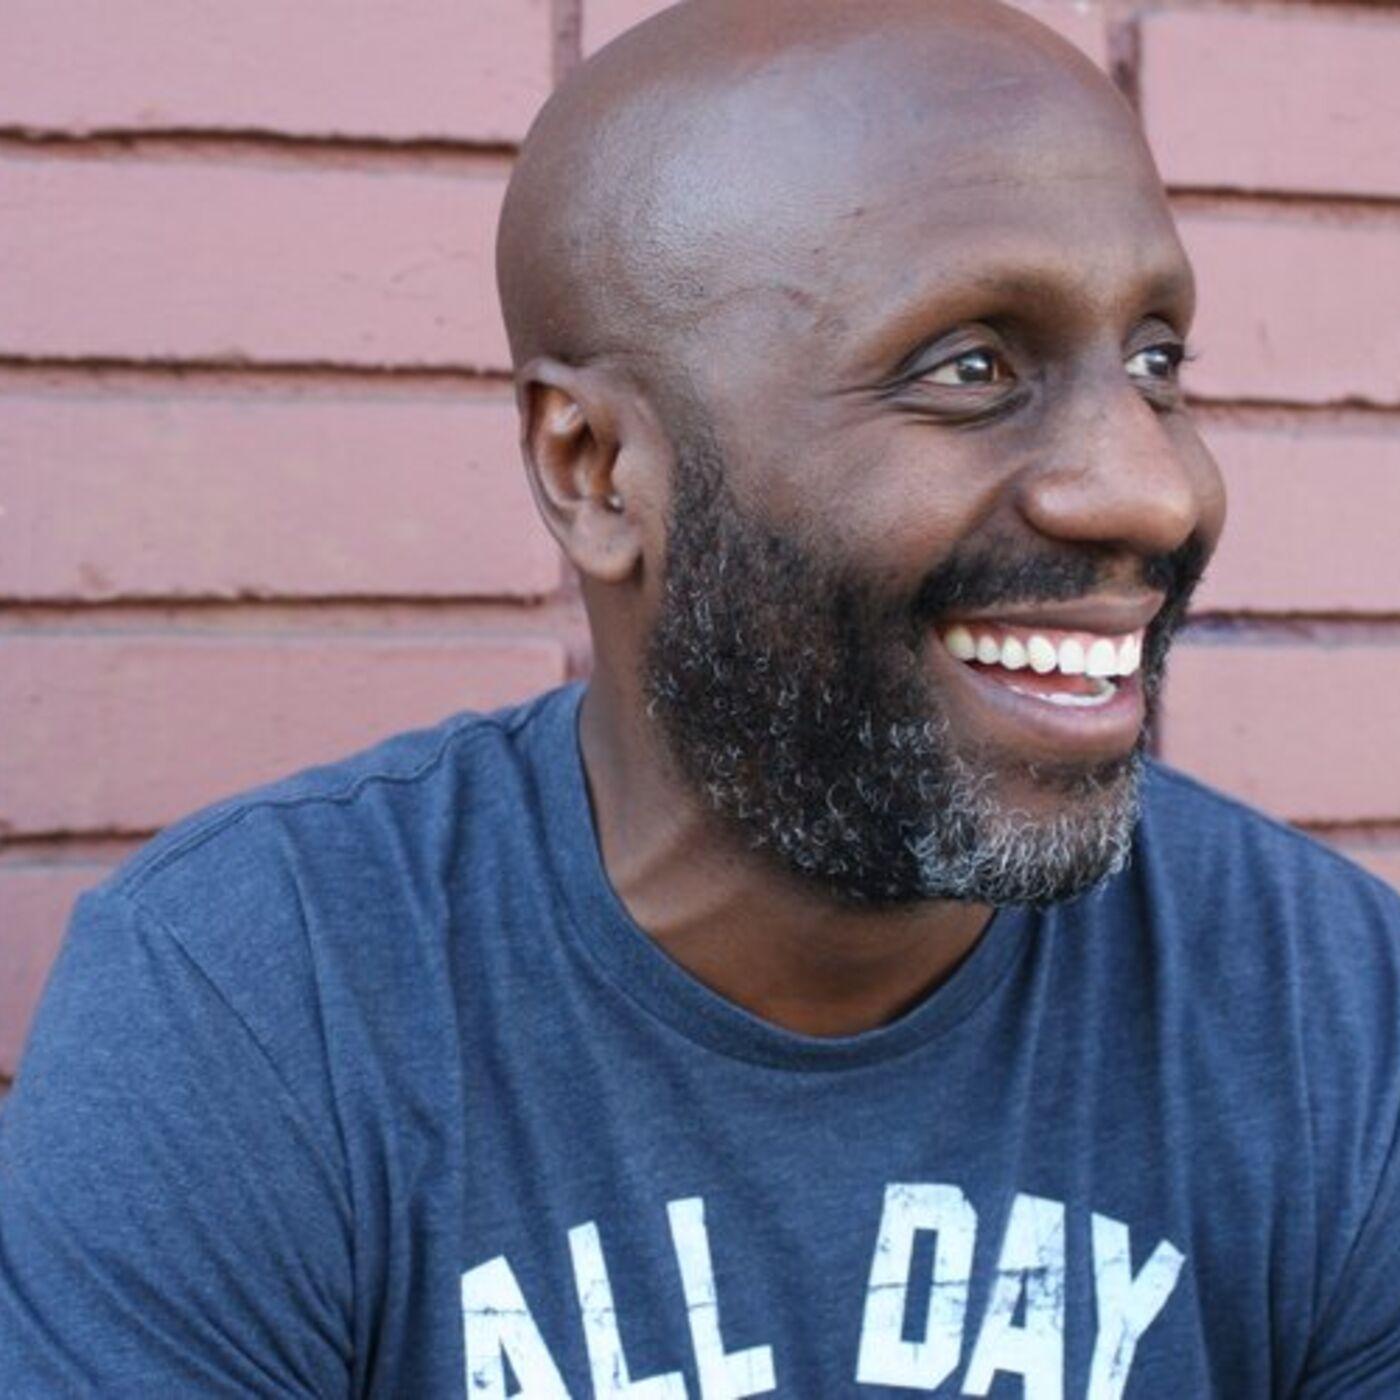 Episode 70 with Shawn Antonio - Celebrity Life Coach, Author, Motivational Speaker